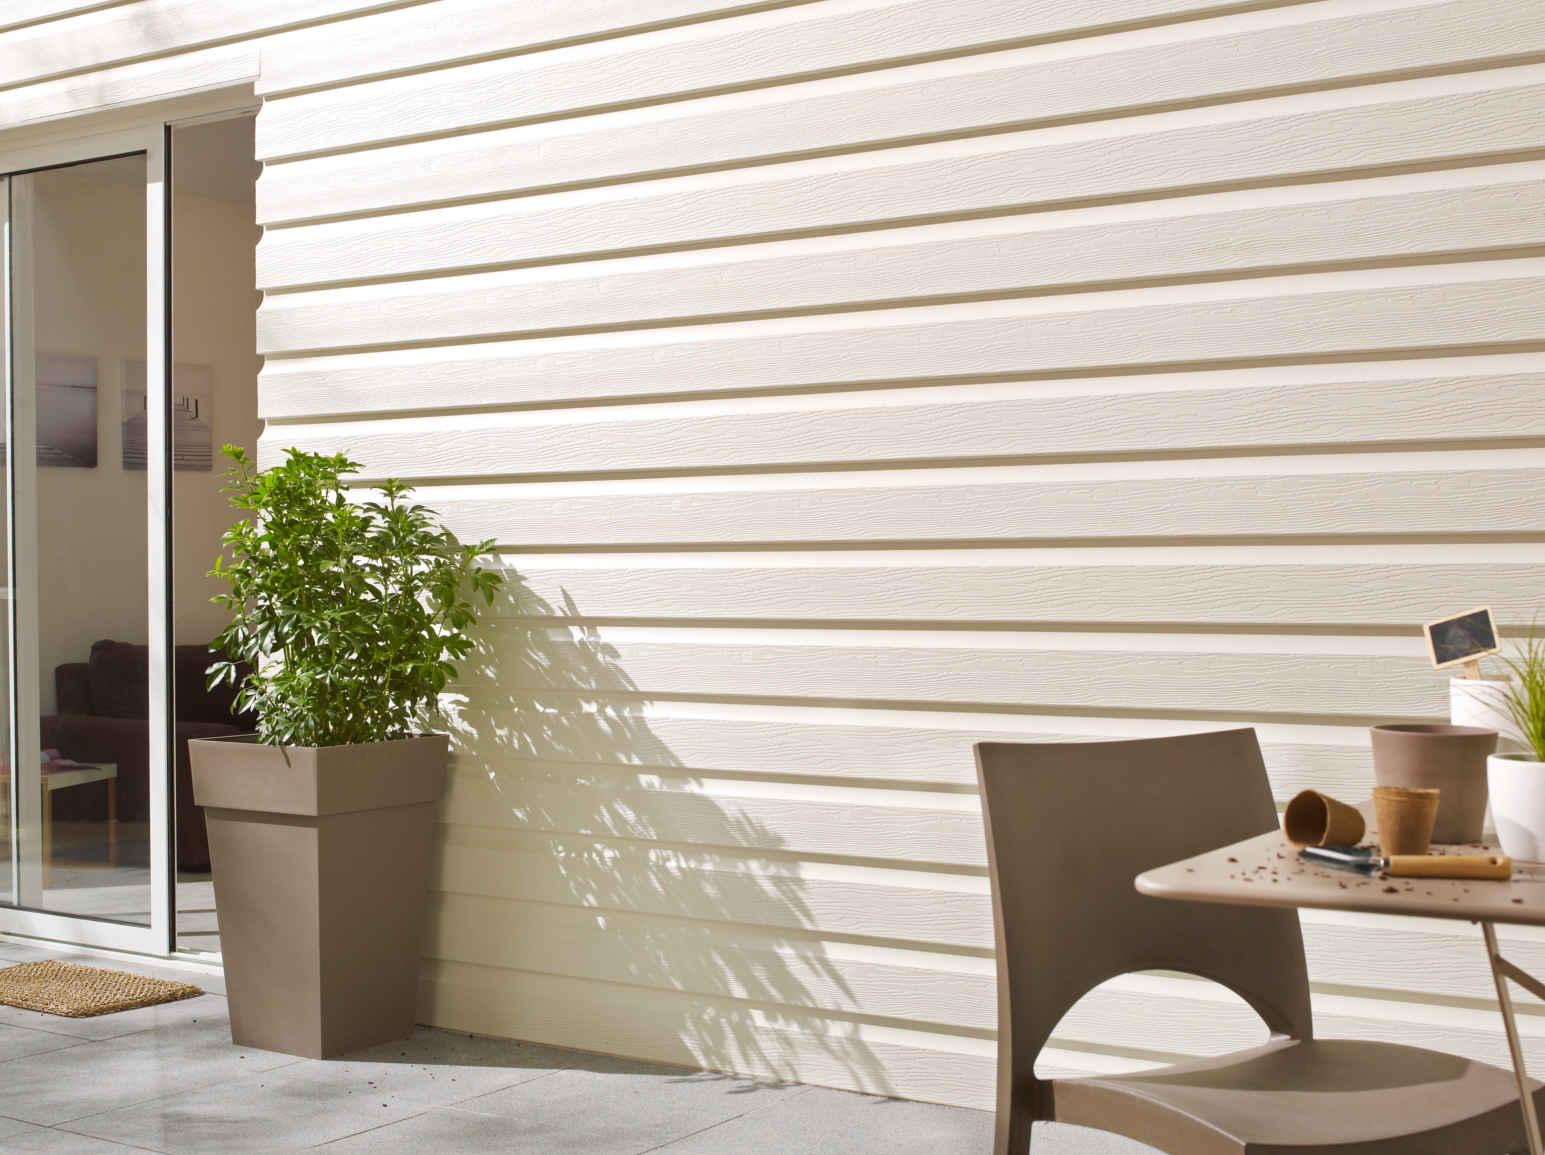 lasure blanche leroy merlin plan de travail stratifi new vintage wood mat l 315 x p. Black Bedroom Furniture Sets. Home Design Ideas